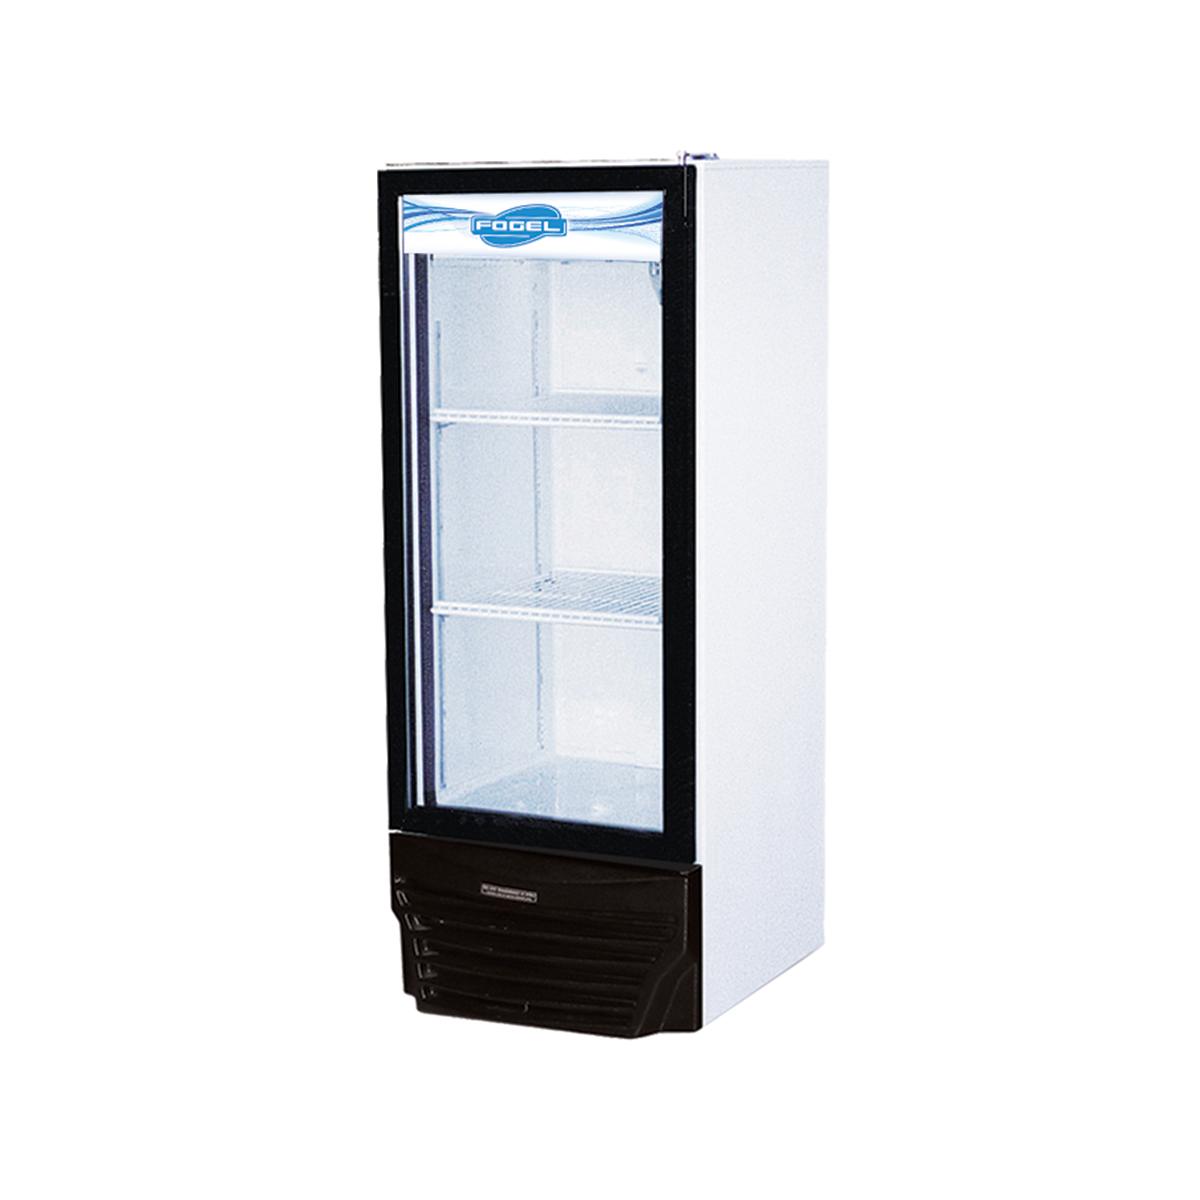 Fogel USA VR-7-HC refrigerator, merchandiser